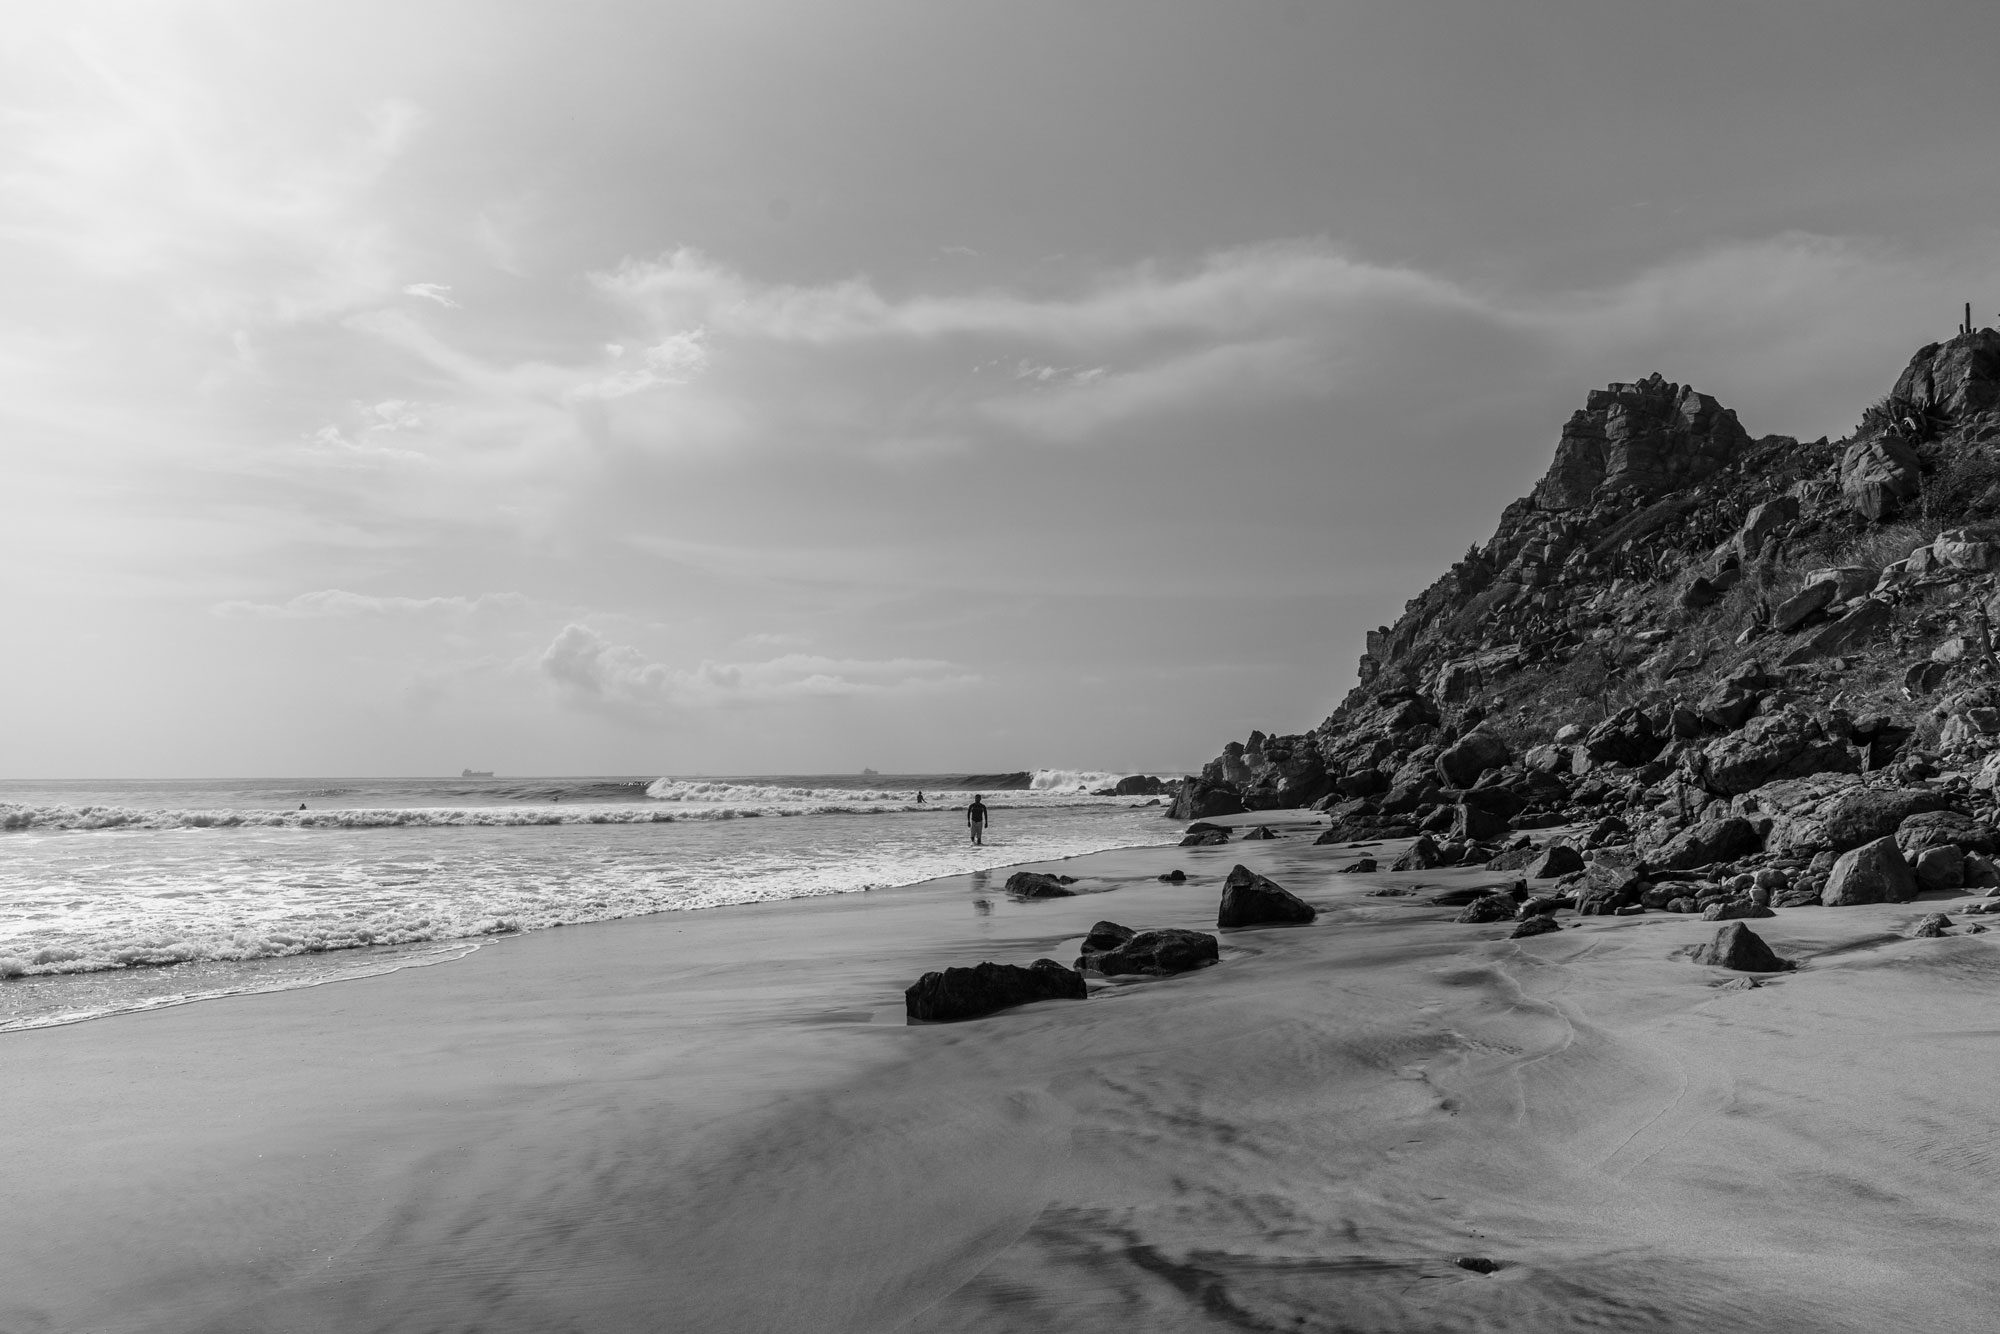 Las Palmeras Surf Camp, Salina Cruz, Oaxaca, Mexico, Photo Marc Mcinnis